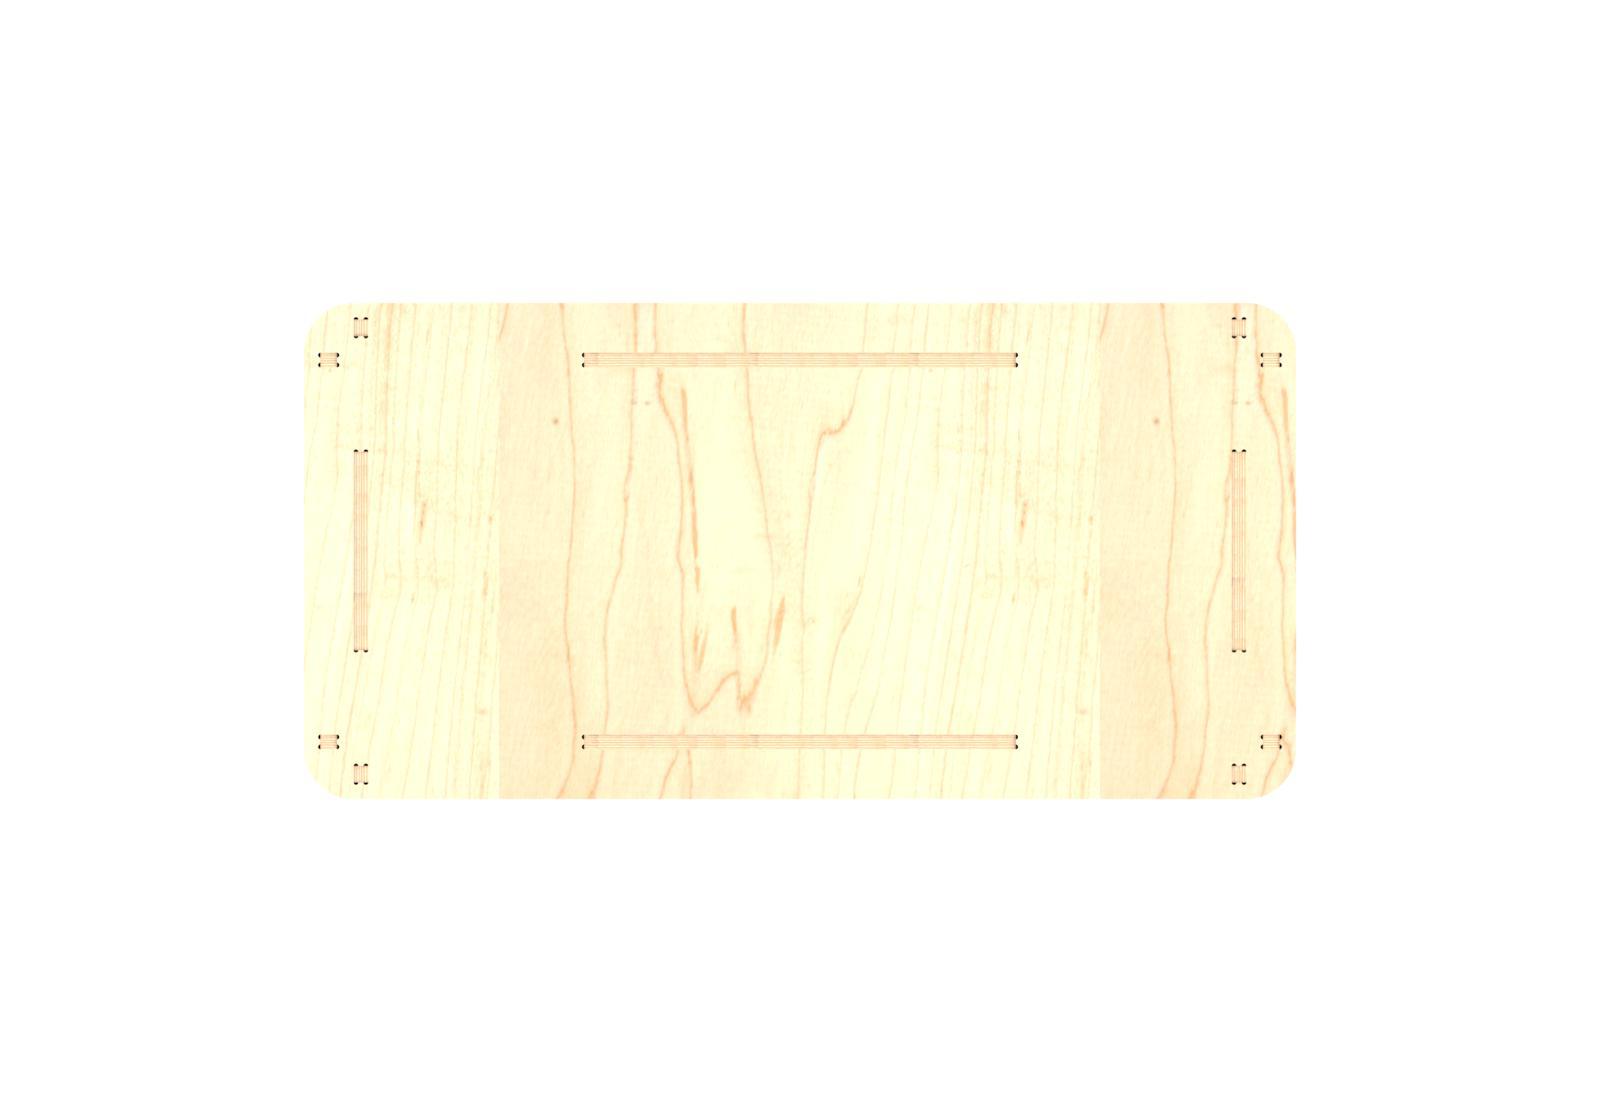 CNCDesk – Design 02 – Top